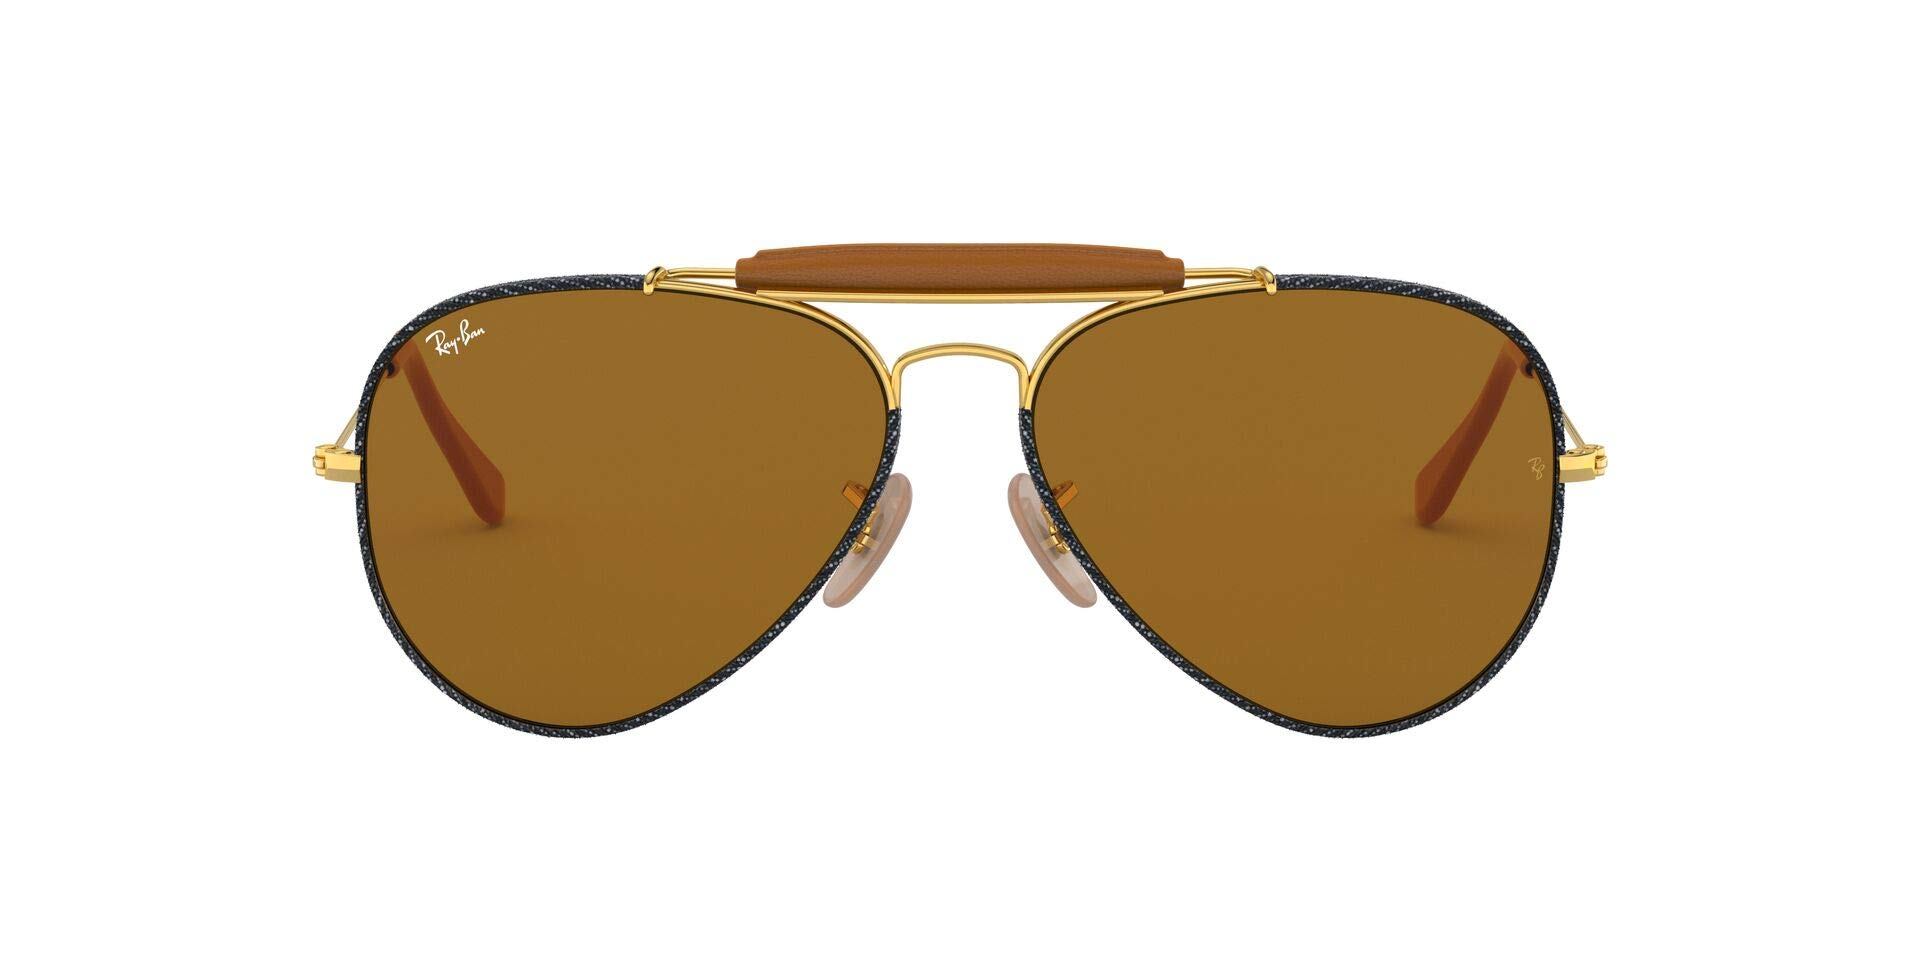 Ray-Ban RB3422Q Outdoorsman Craft Aviator Sunglasses